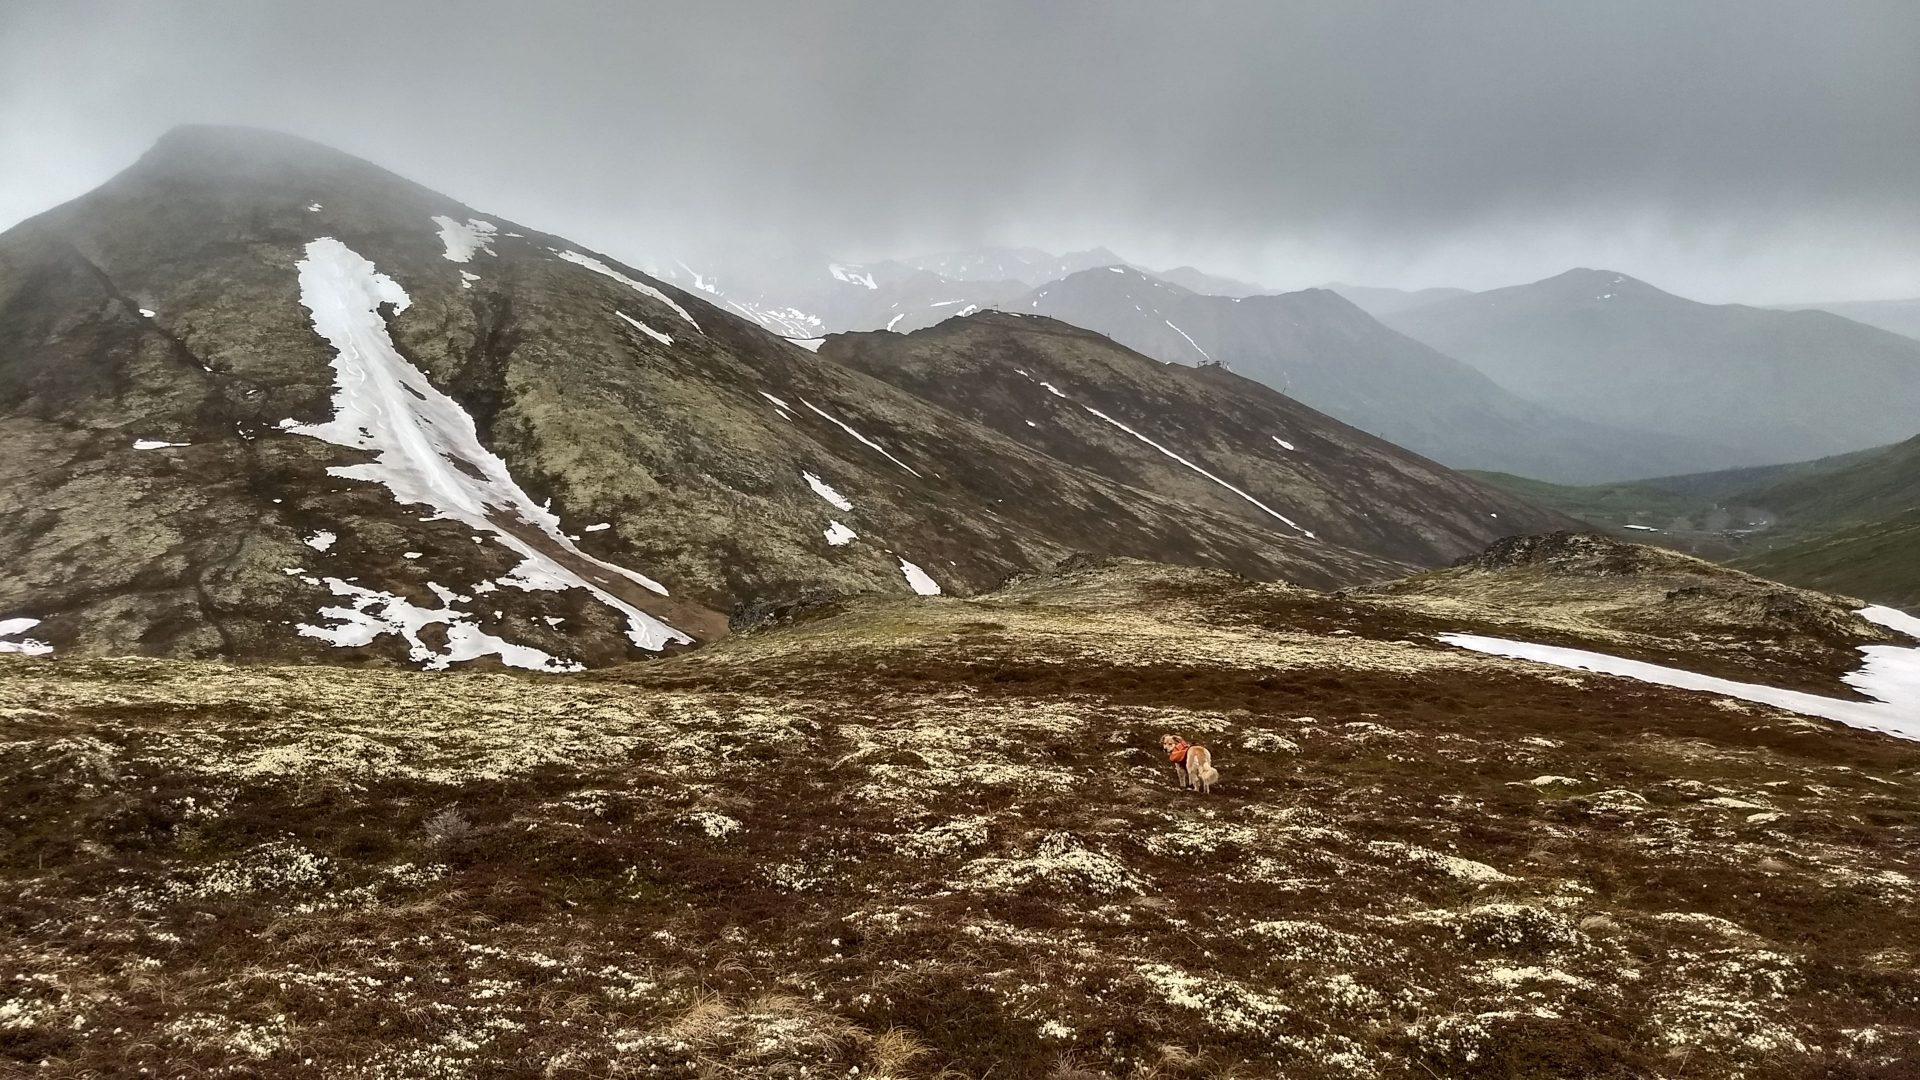 Saddle between Mt. Gordon Lyon and Rendezvous Peak